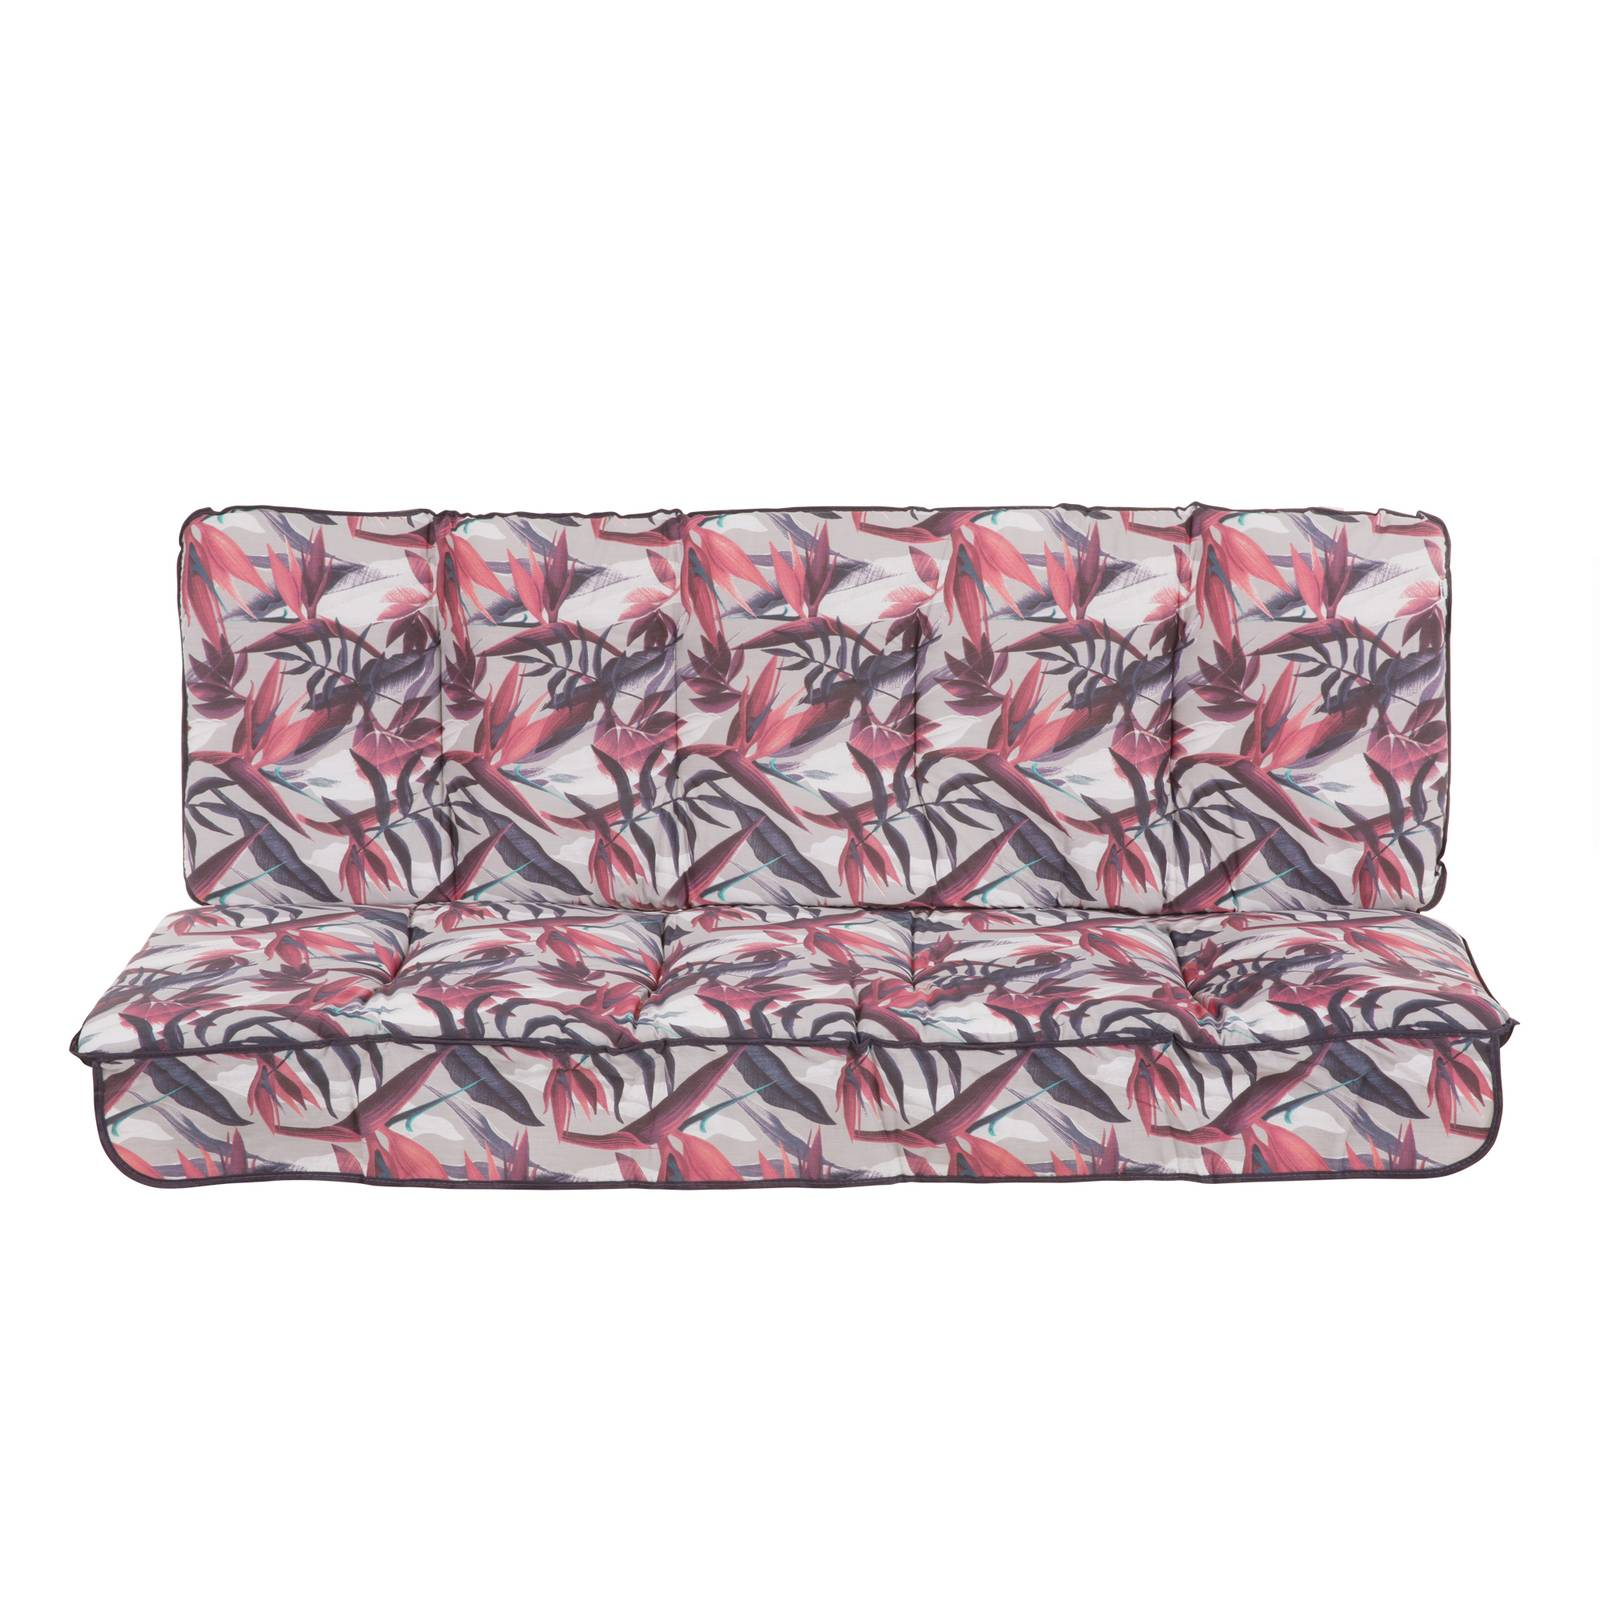 Poduszki na huśtawkę 150 cm Latina A092-03PB PATIO